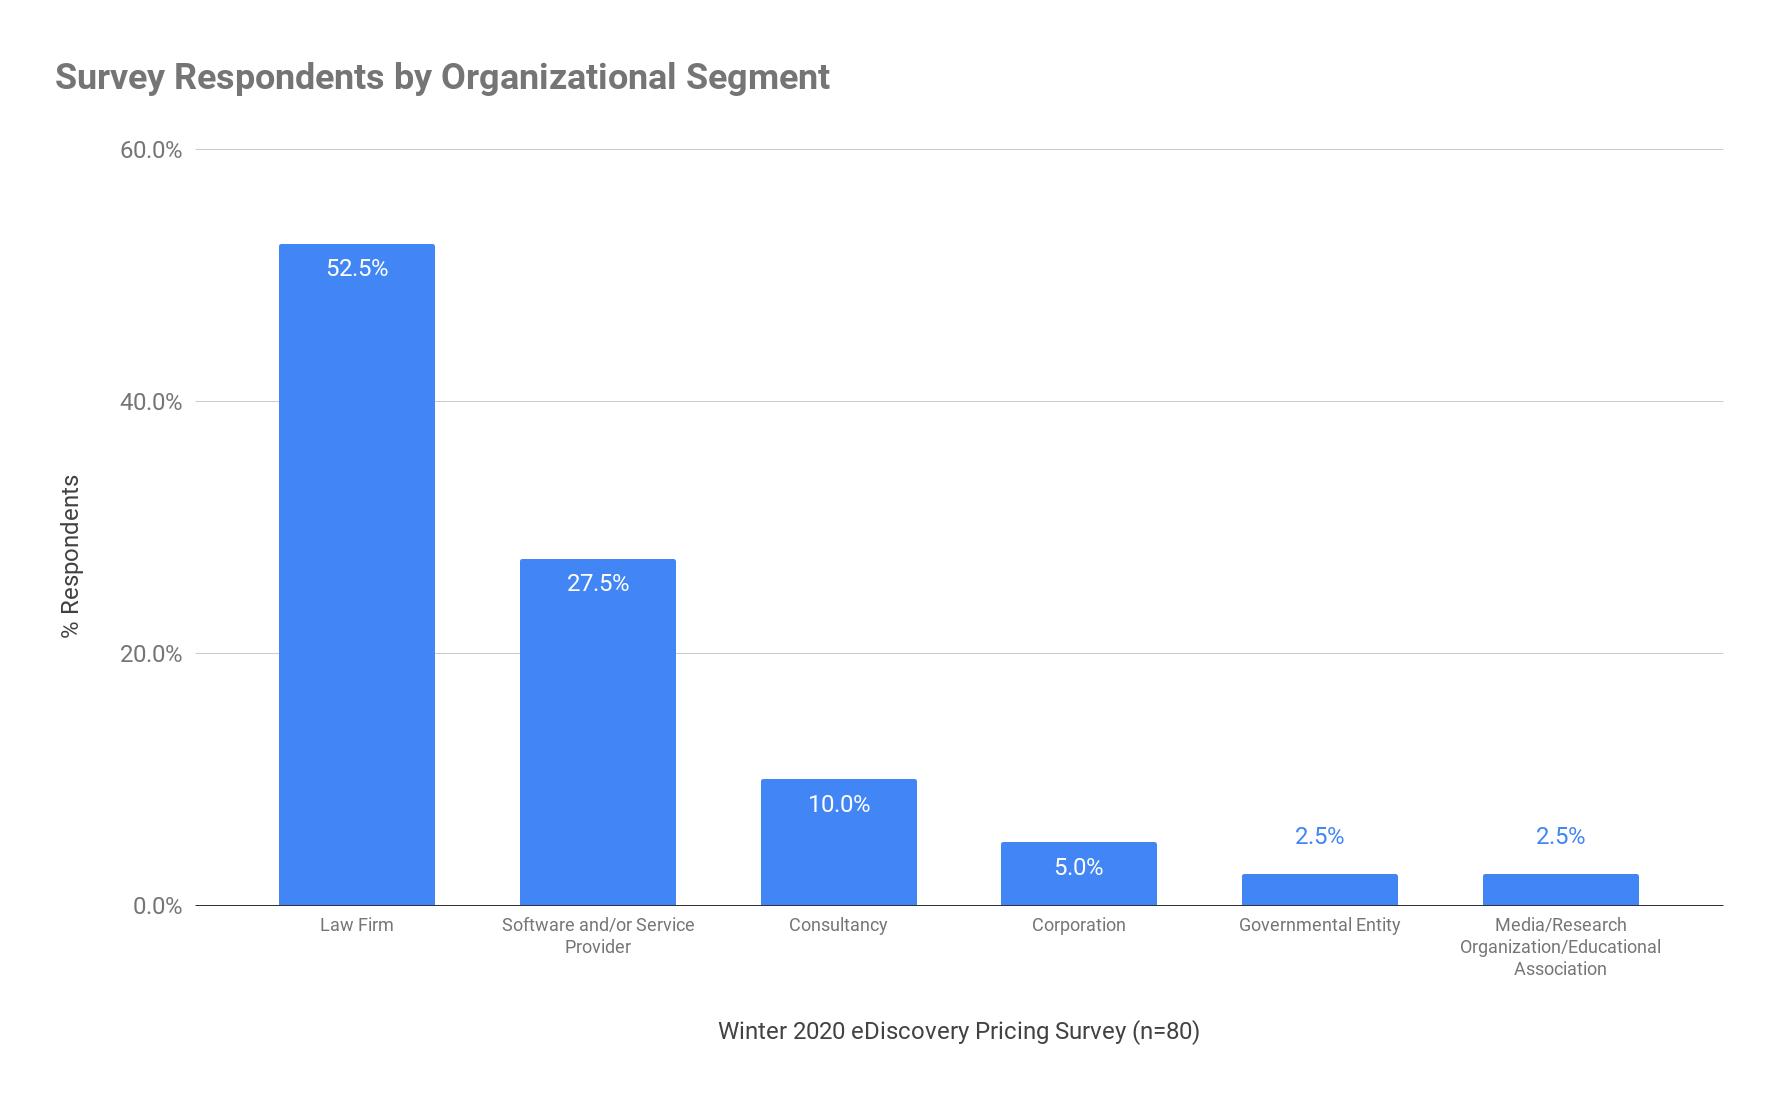 Survey Respondents by Organizational Segment - Winter 2020